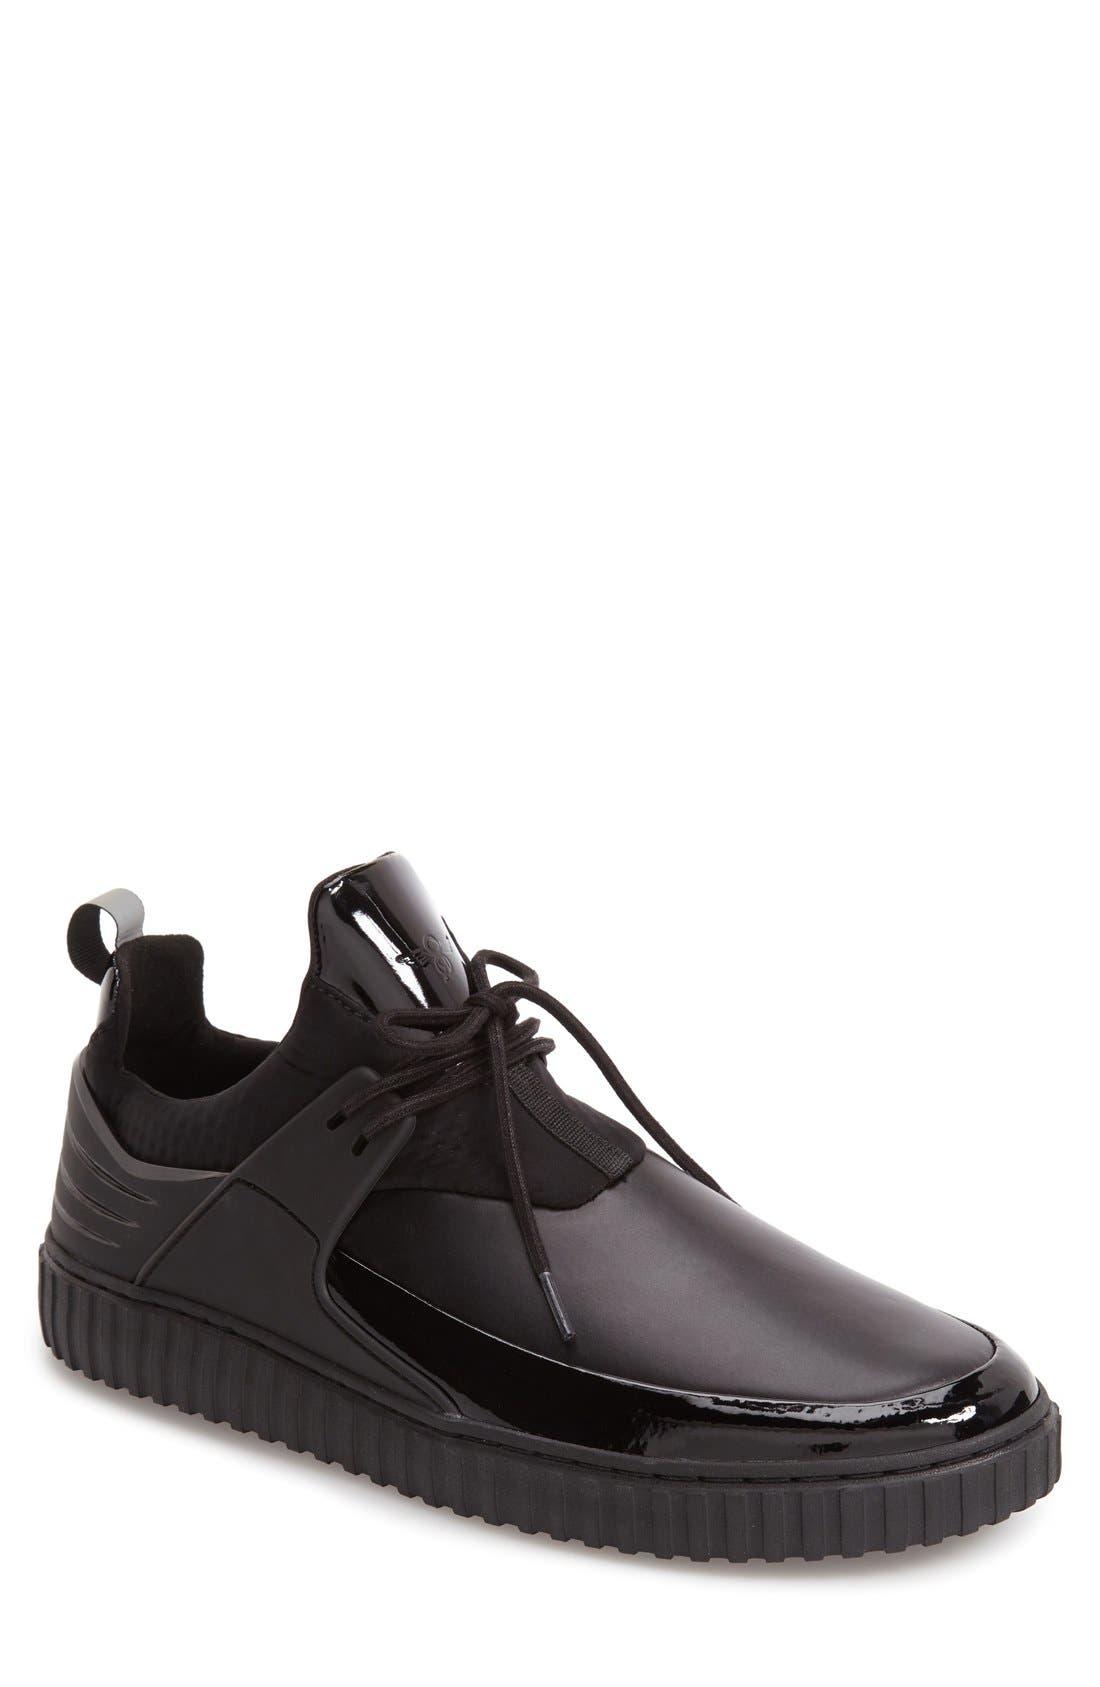 x Nick Jonas Castucci Sneaker,                             Main thumbnail 1, color,                             004